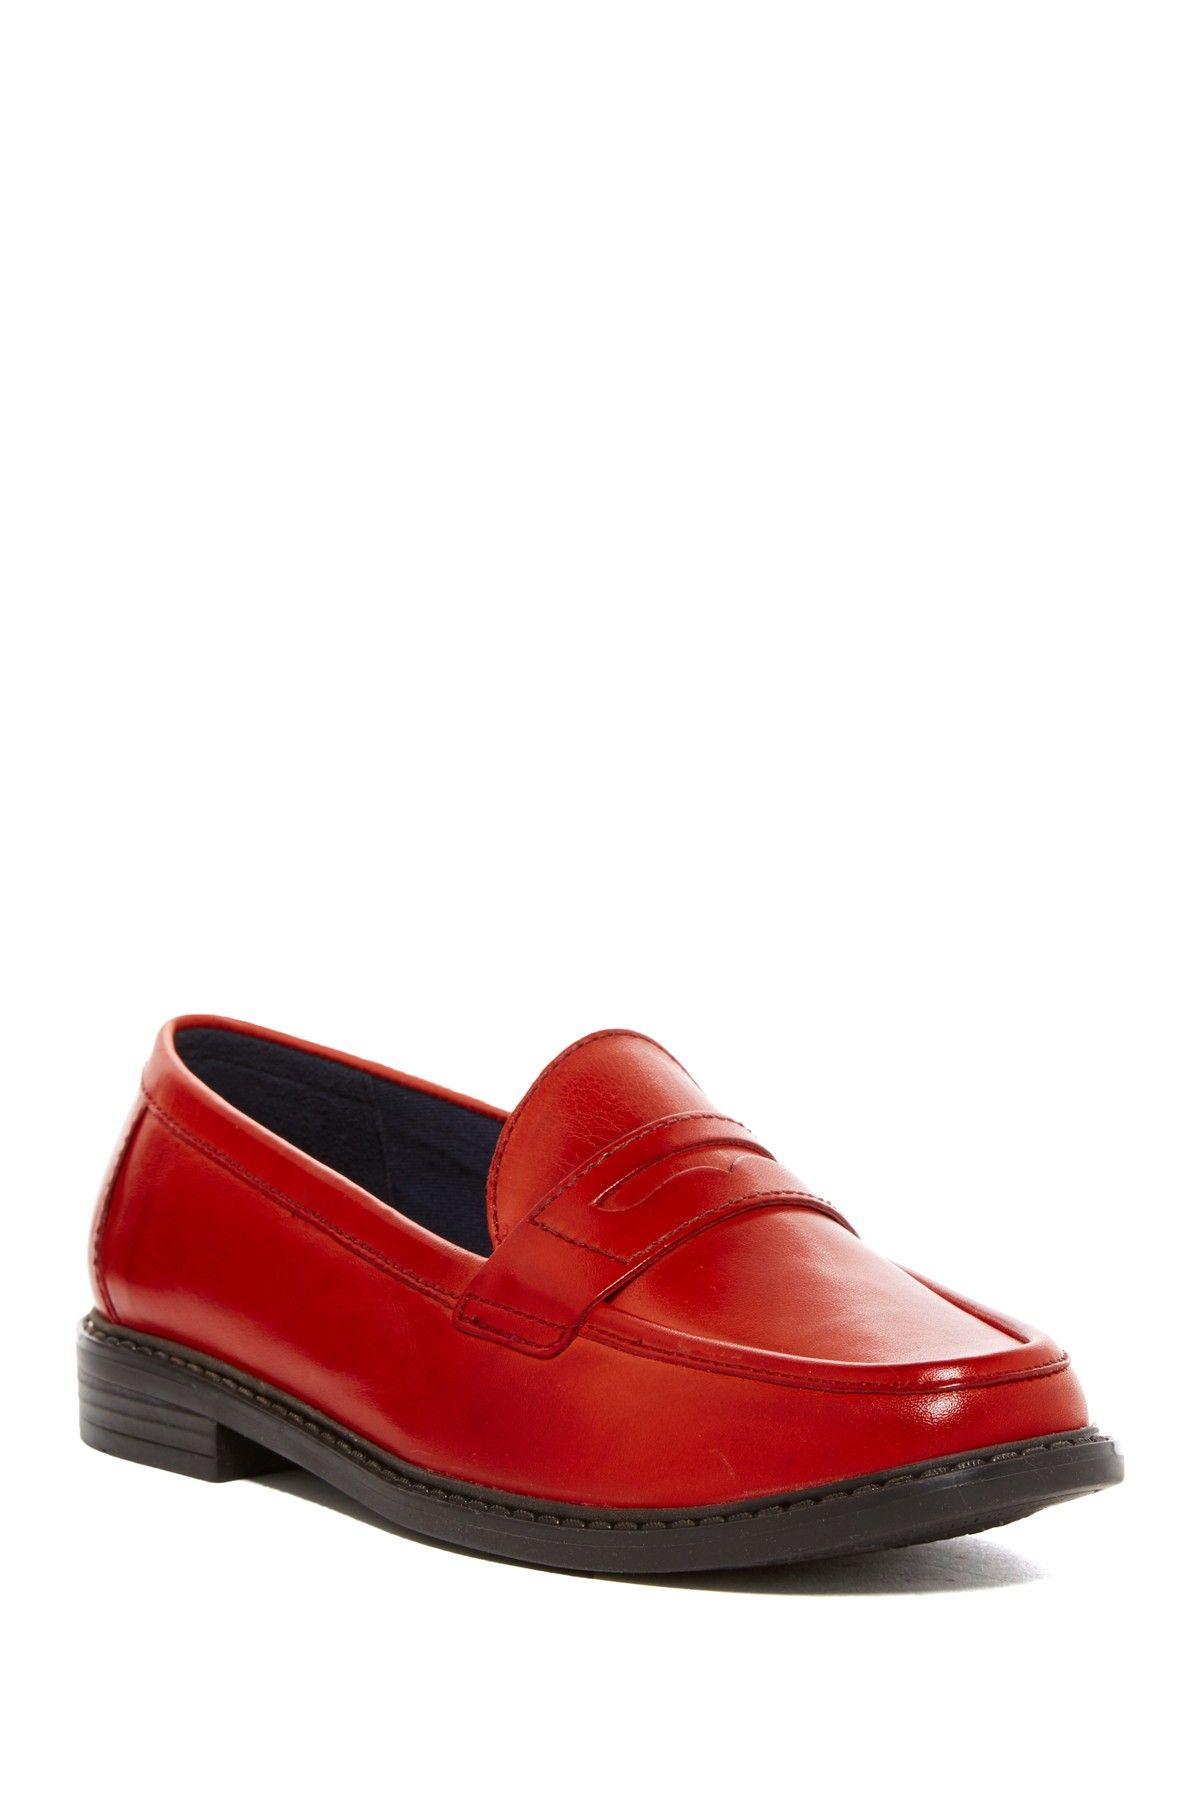 Hommes Cole Haan Campus Pinch Bit Chaussures Loafer r9sMd